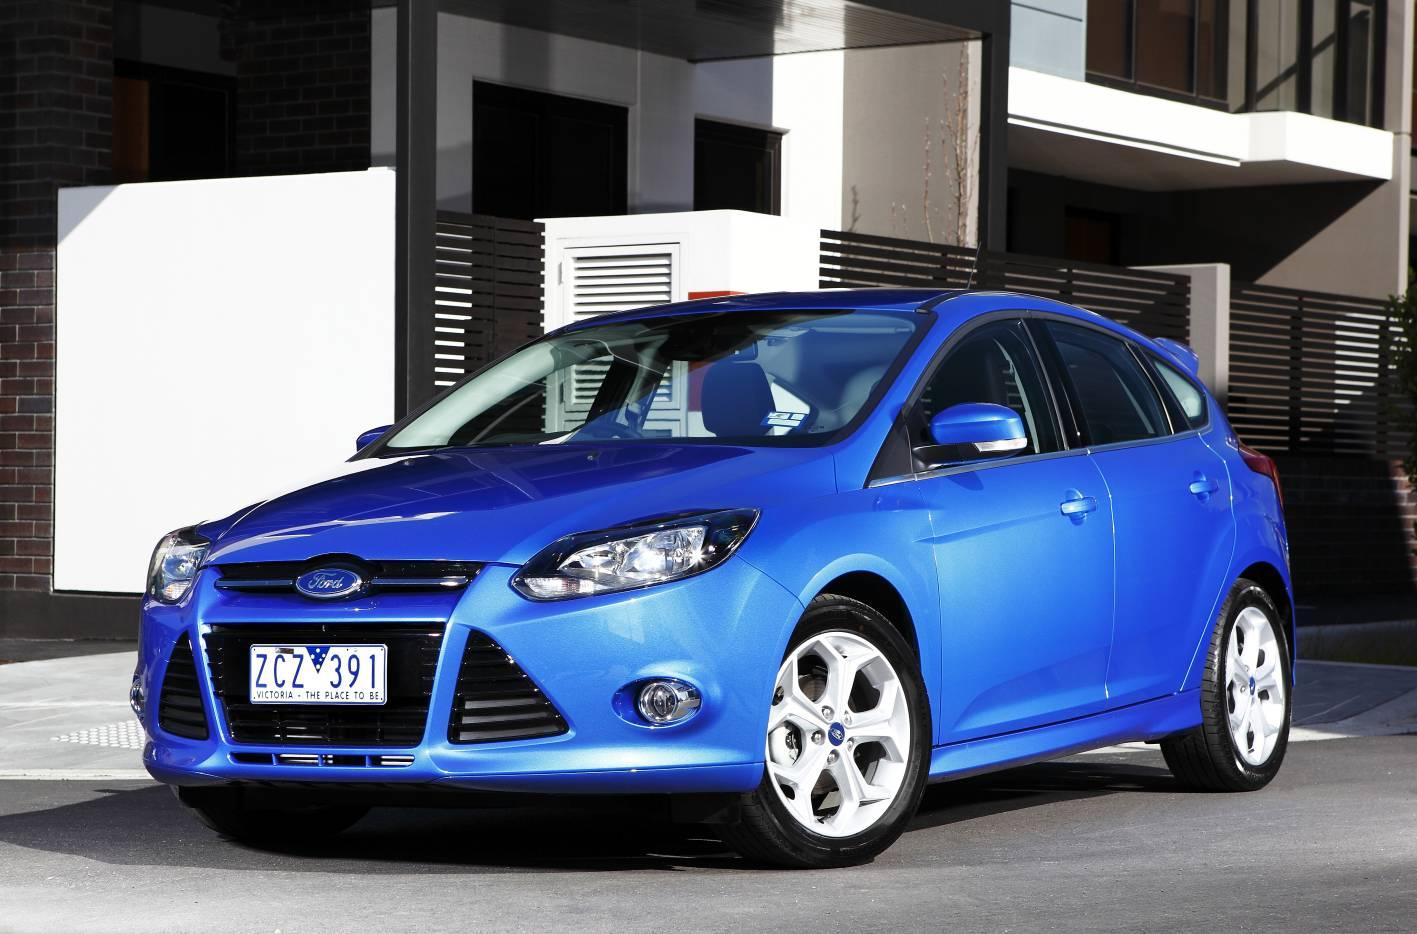 Ford Focus Fiesta Ecosport Warranties Extended Over Dual